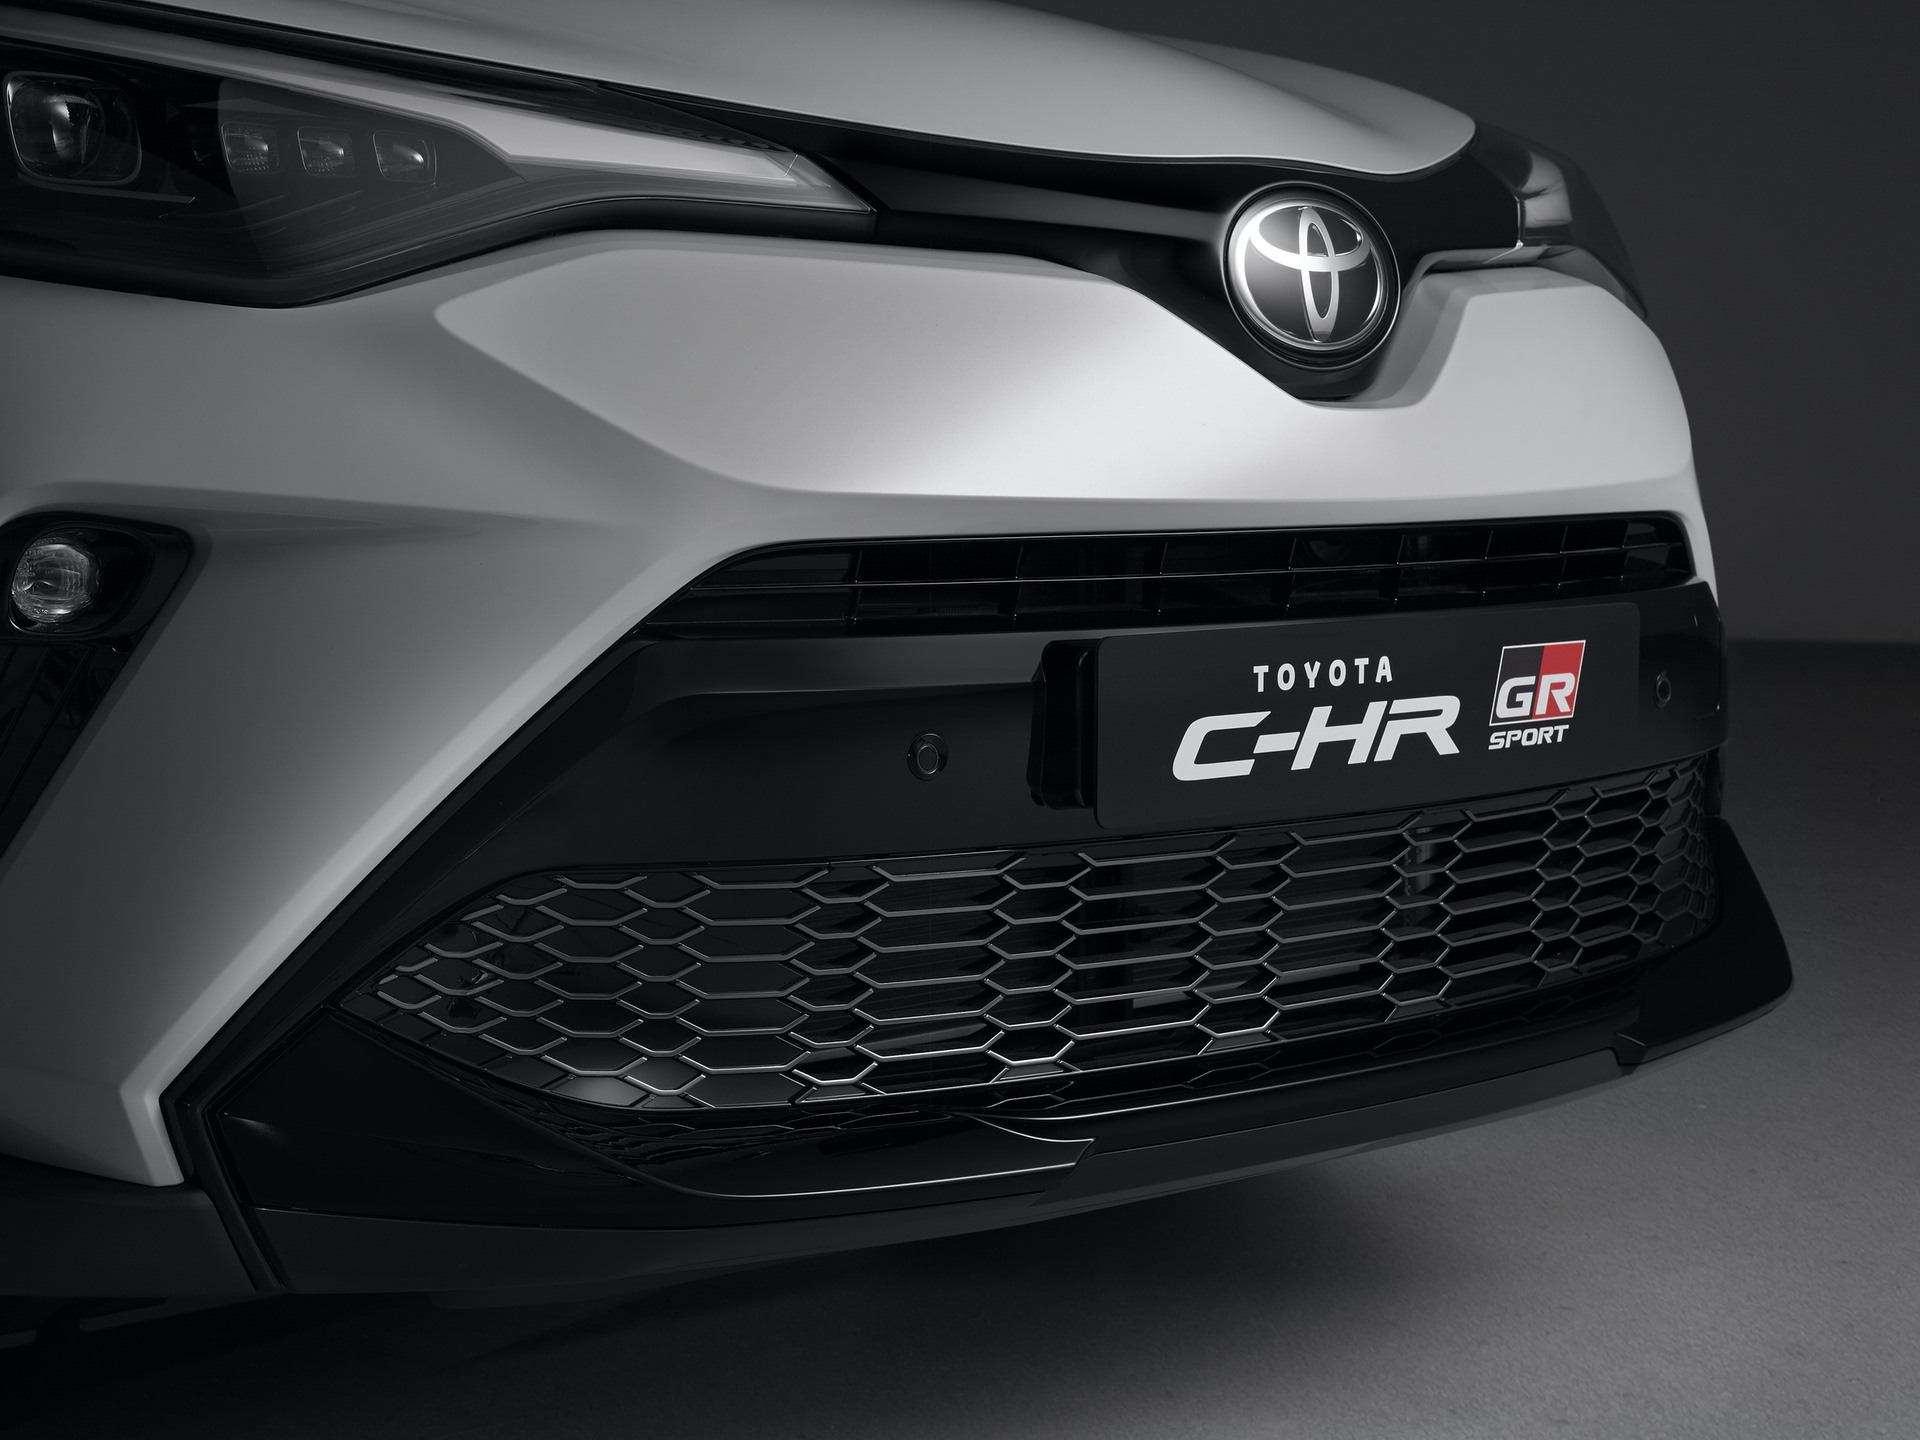 Toyota_C-HR_GR_Sport_0010